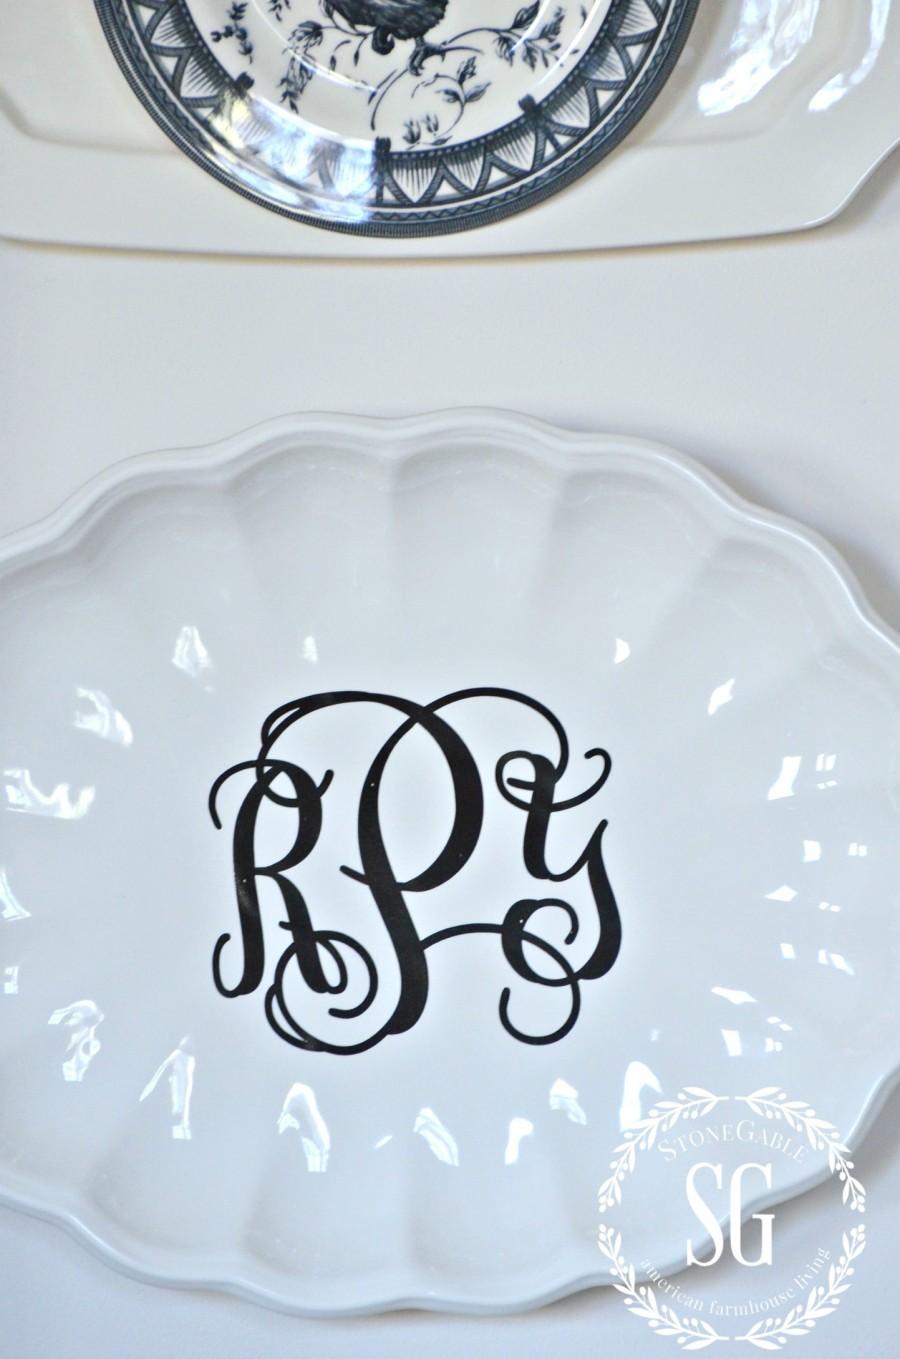 HOW TO LAYER DISH ART-embellished platters-stonegableblogcom